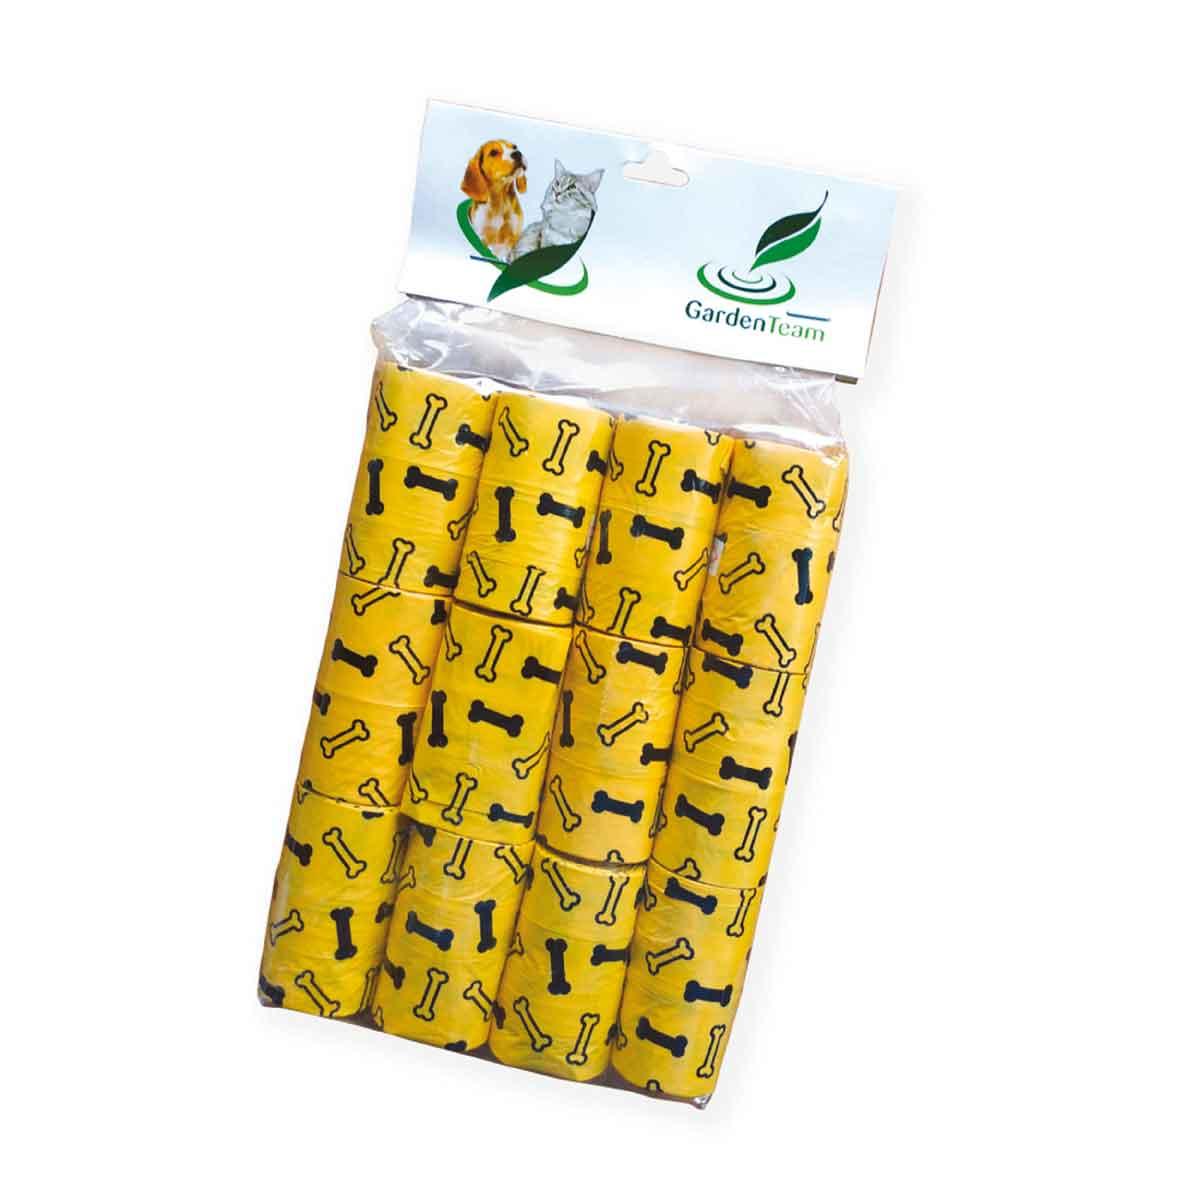 Sacchettini igienici ecologici da 24pz